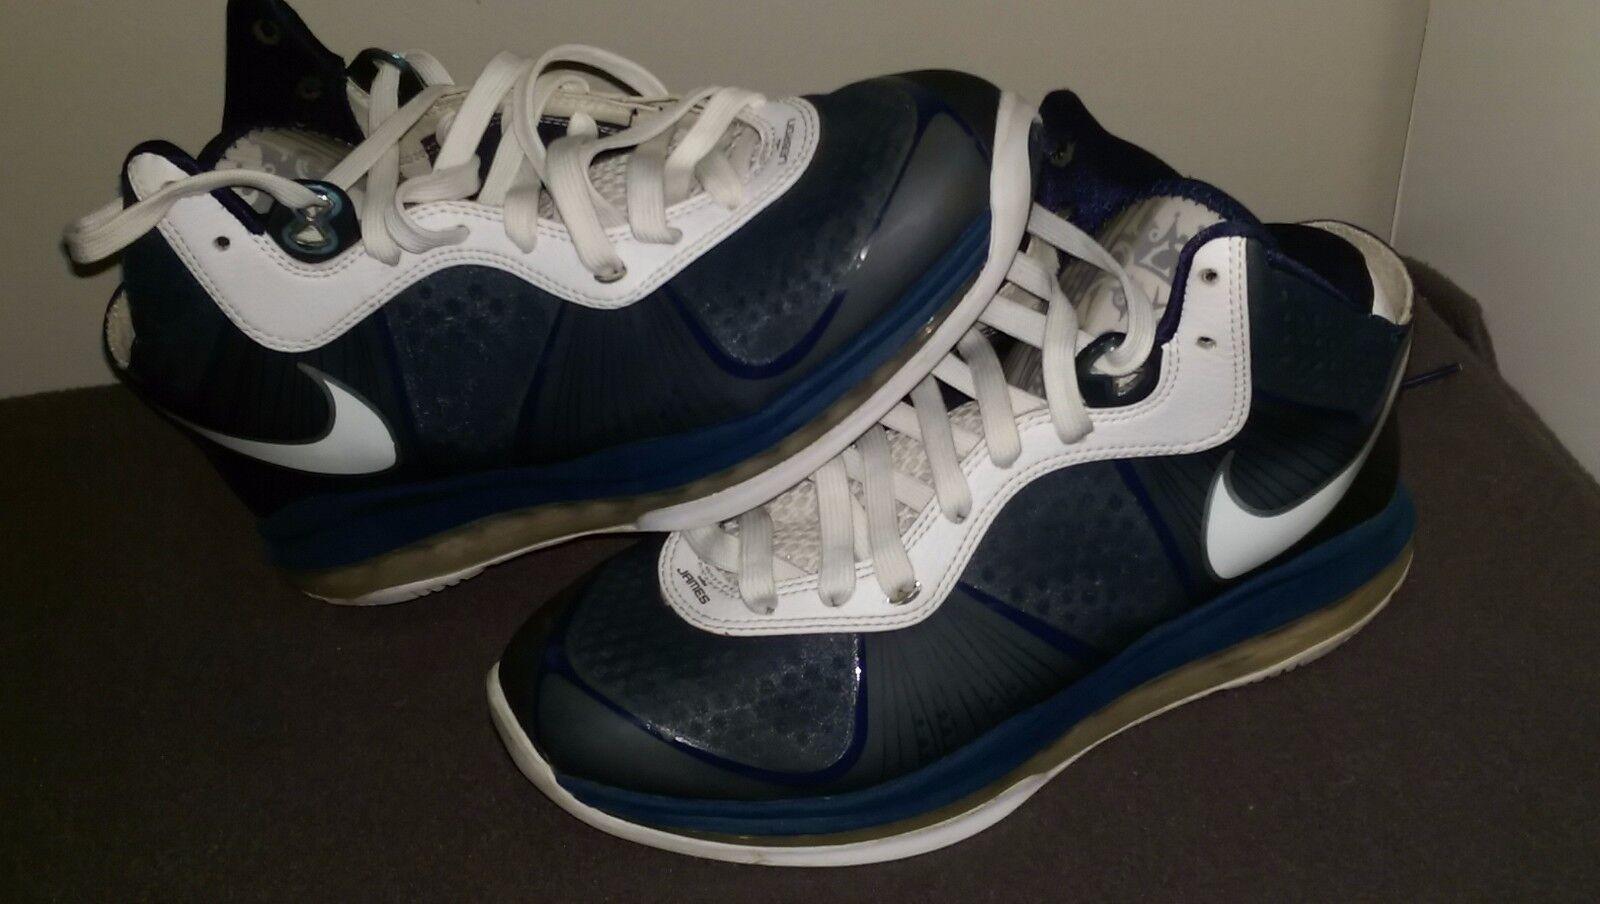 Nike Lebron VIII 8 V/2 Midnight Navy/Silver New York Yankees 429676-400 Size 8